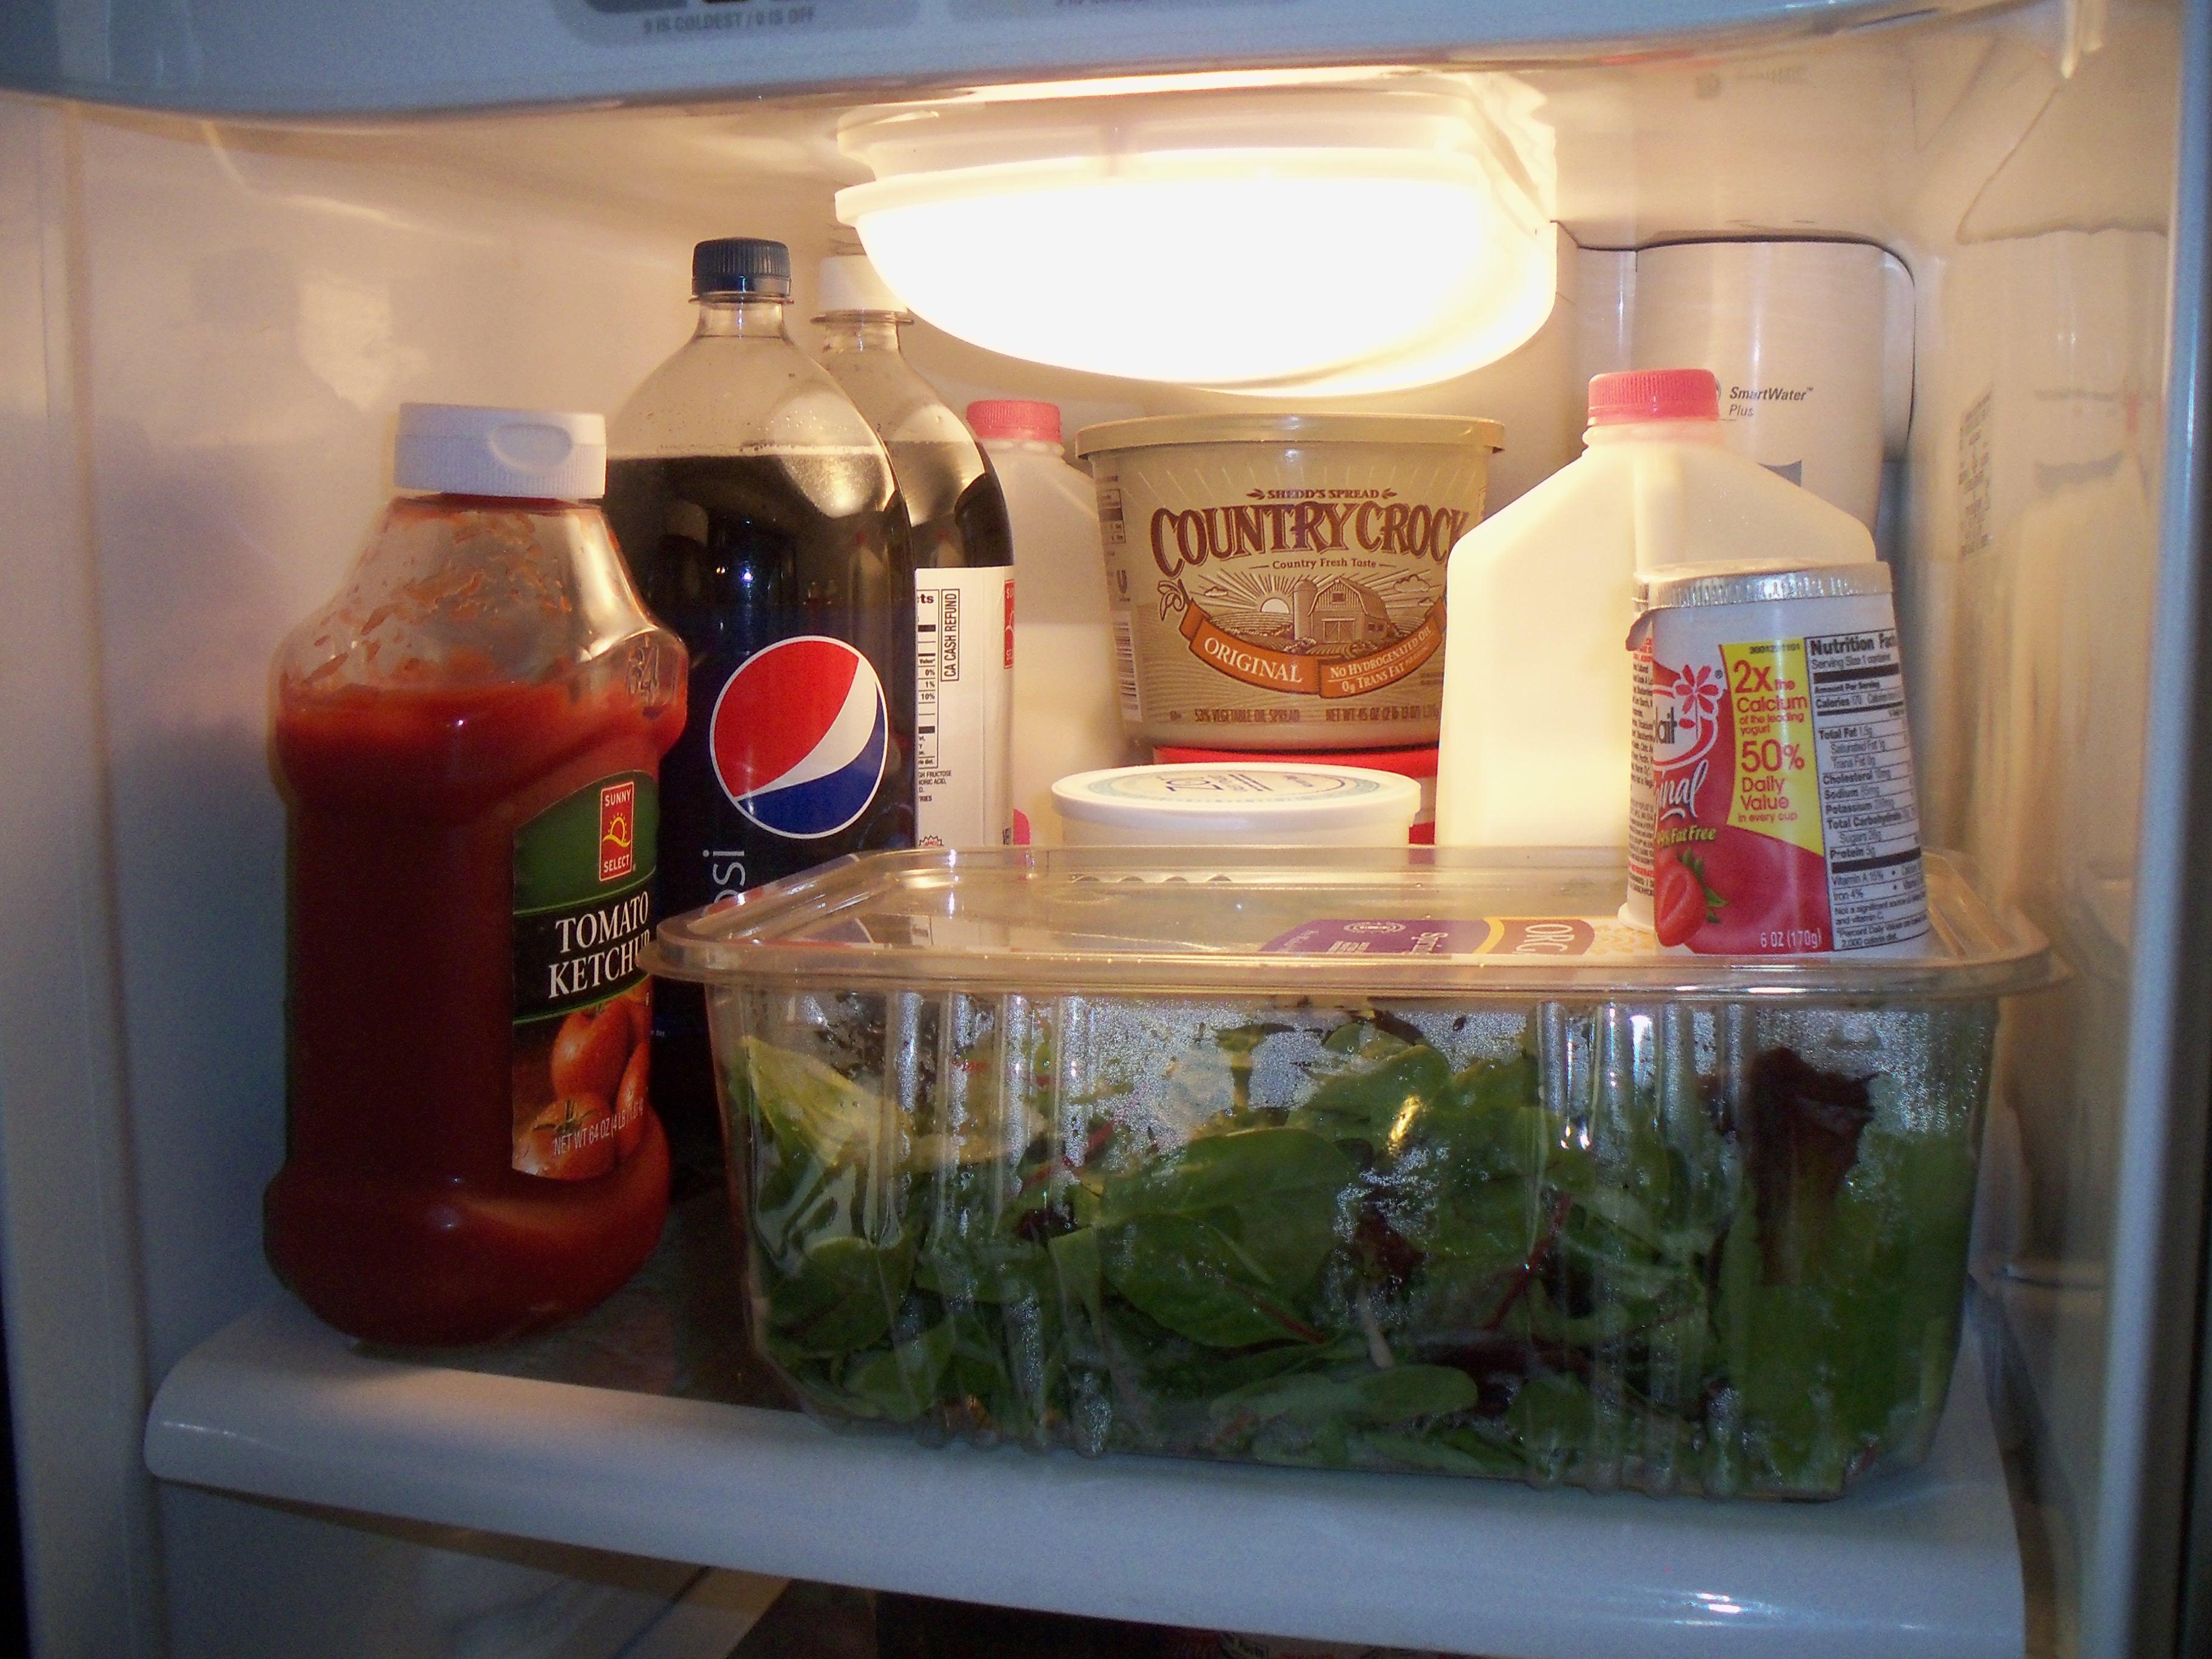 Picture of Refrigerator Shelf Extender